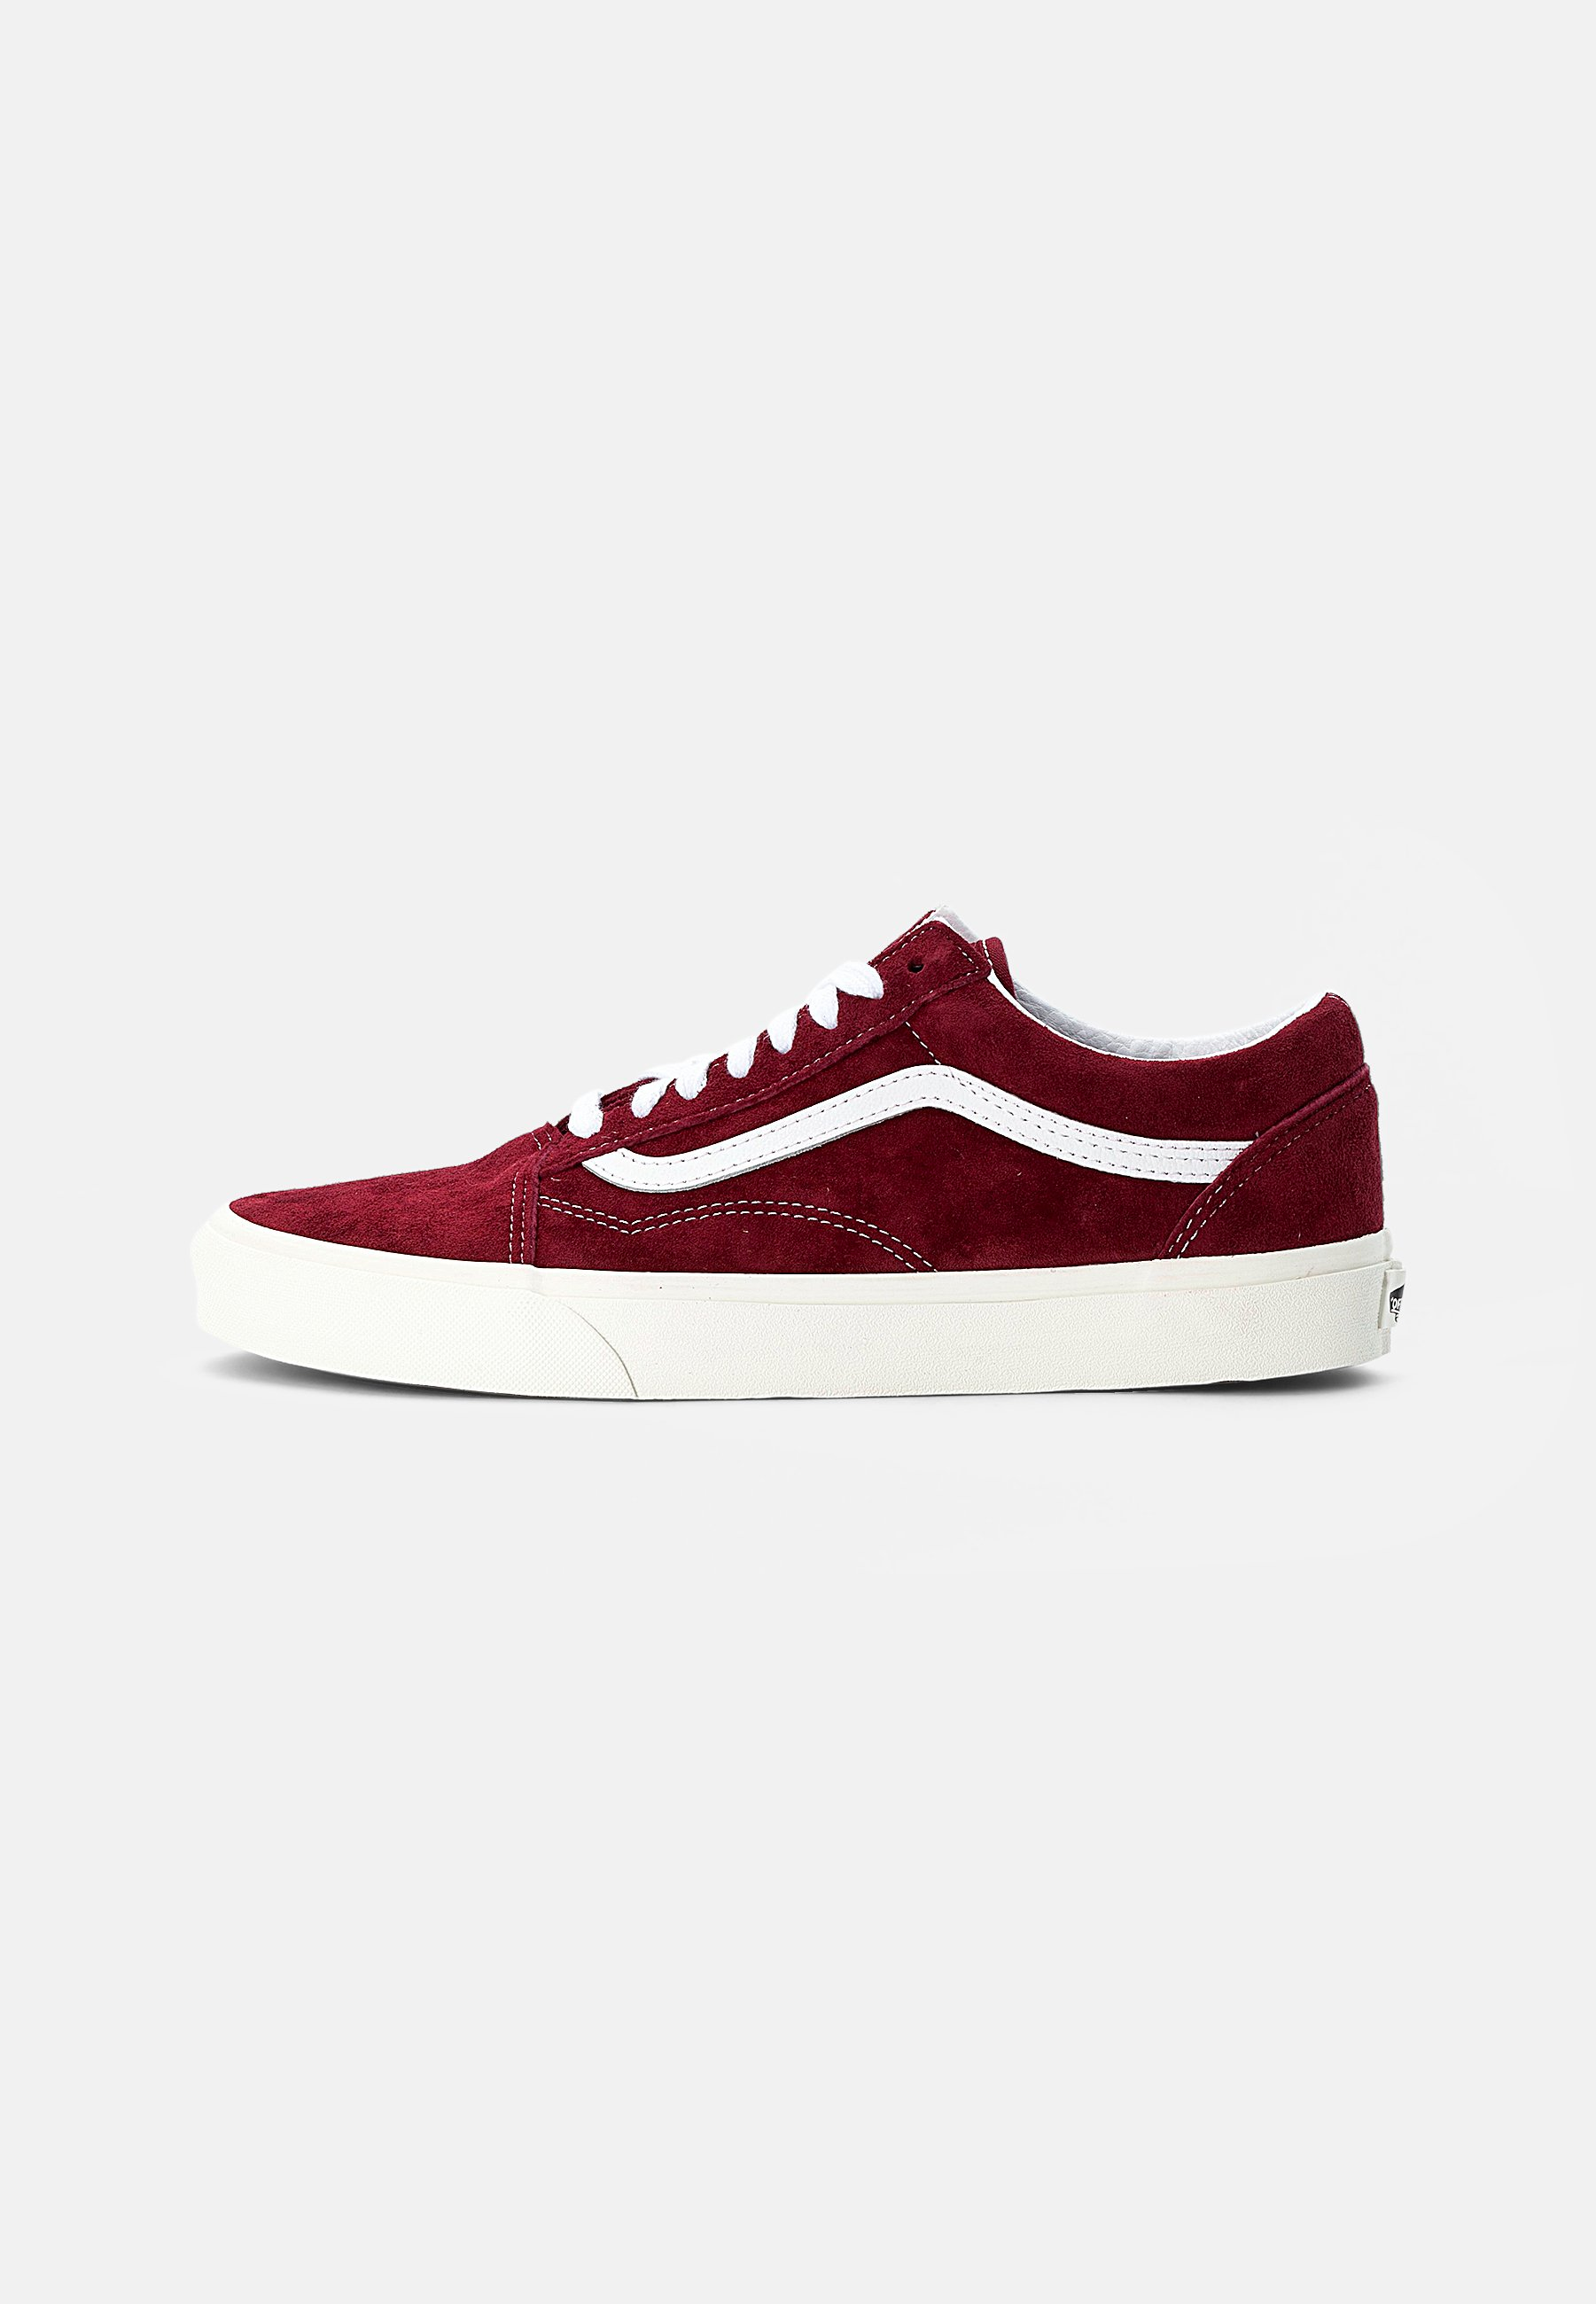 Chaussures femme Vans rouge en ligne | ZALANDO